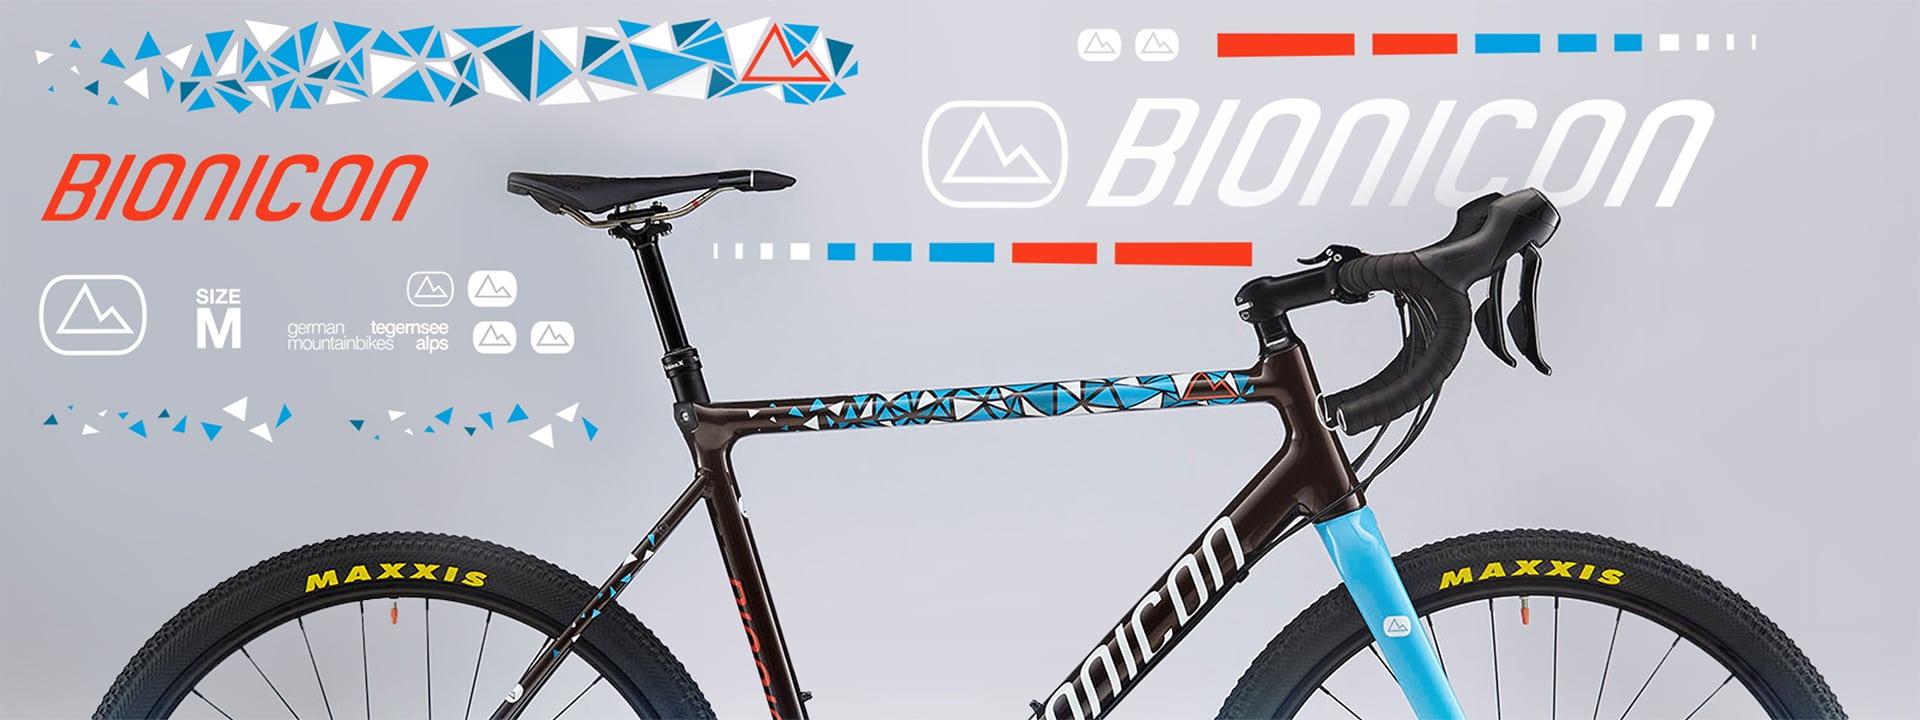 framedesign_projekter_industrial_design_bionicon